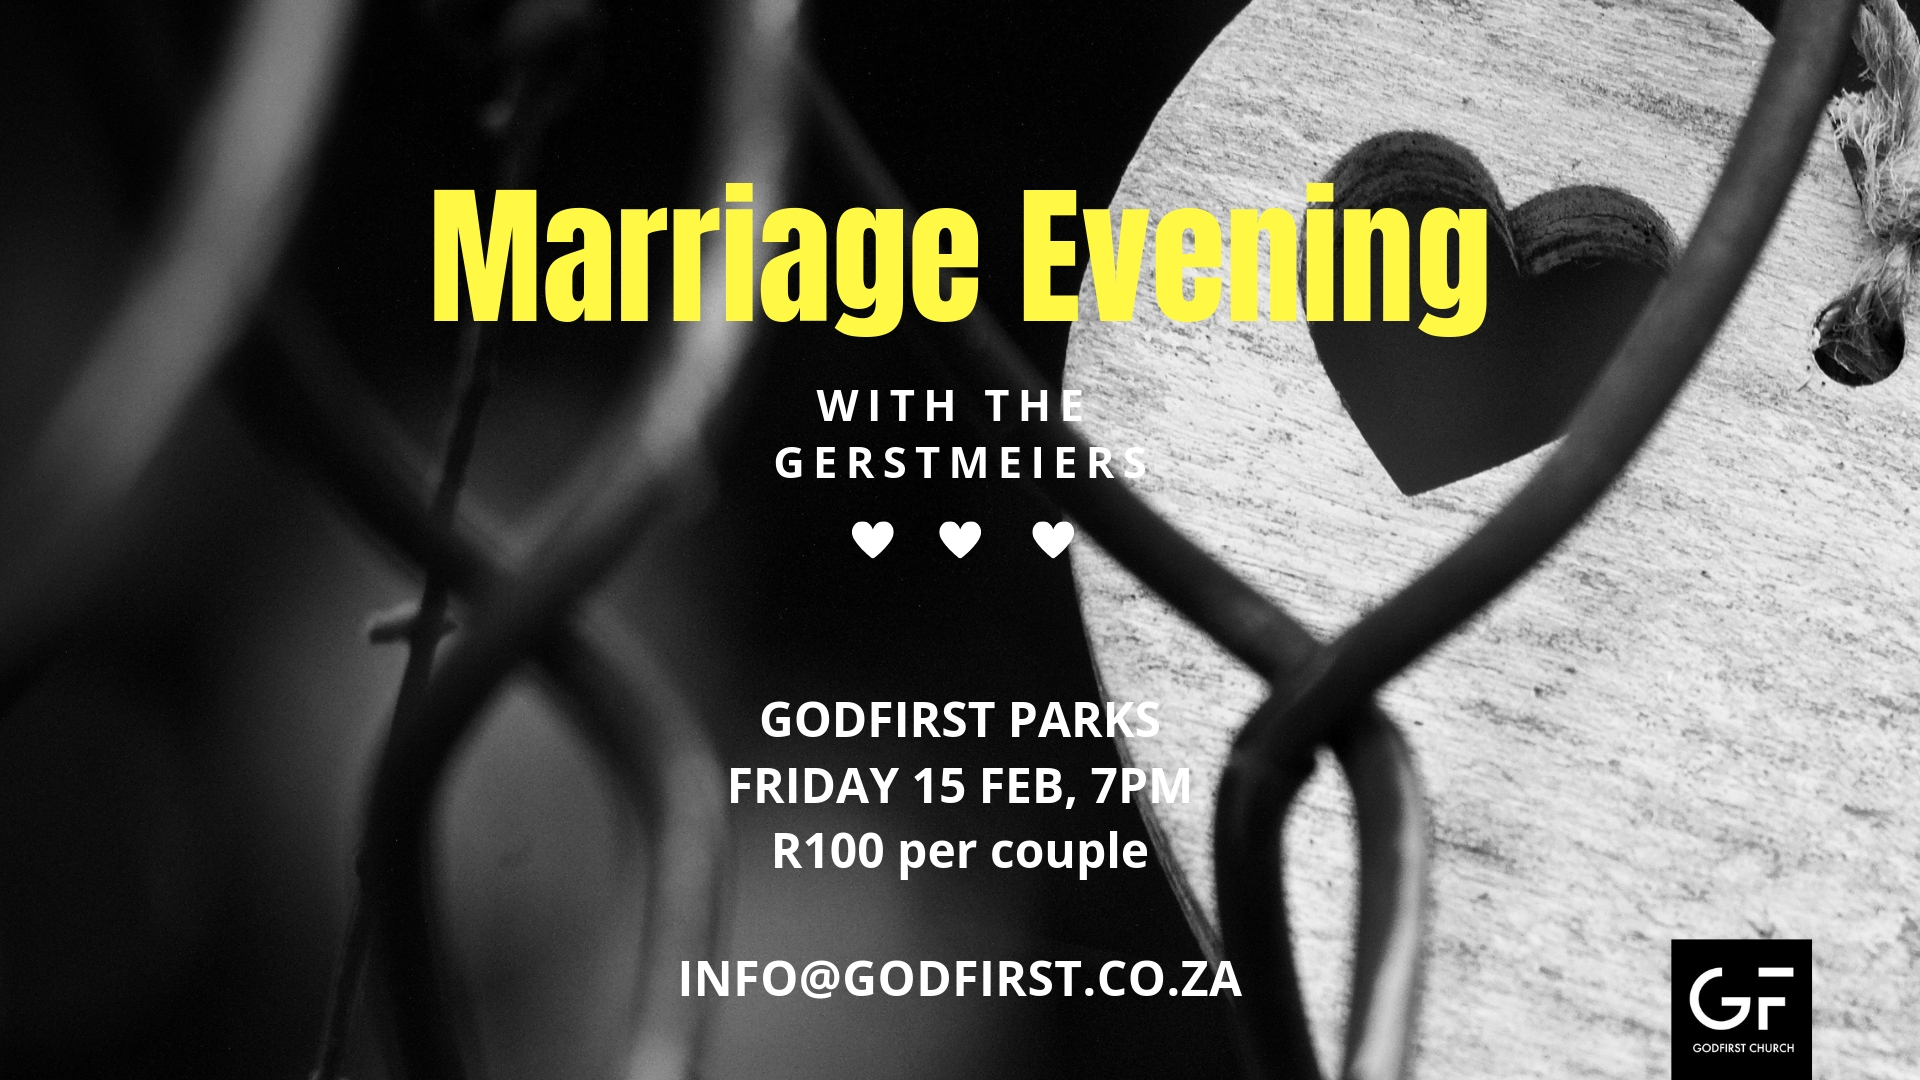 Marriage Evening Slide 3(1).jpg